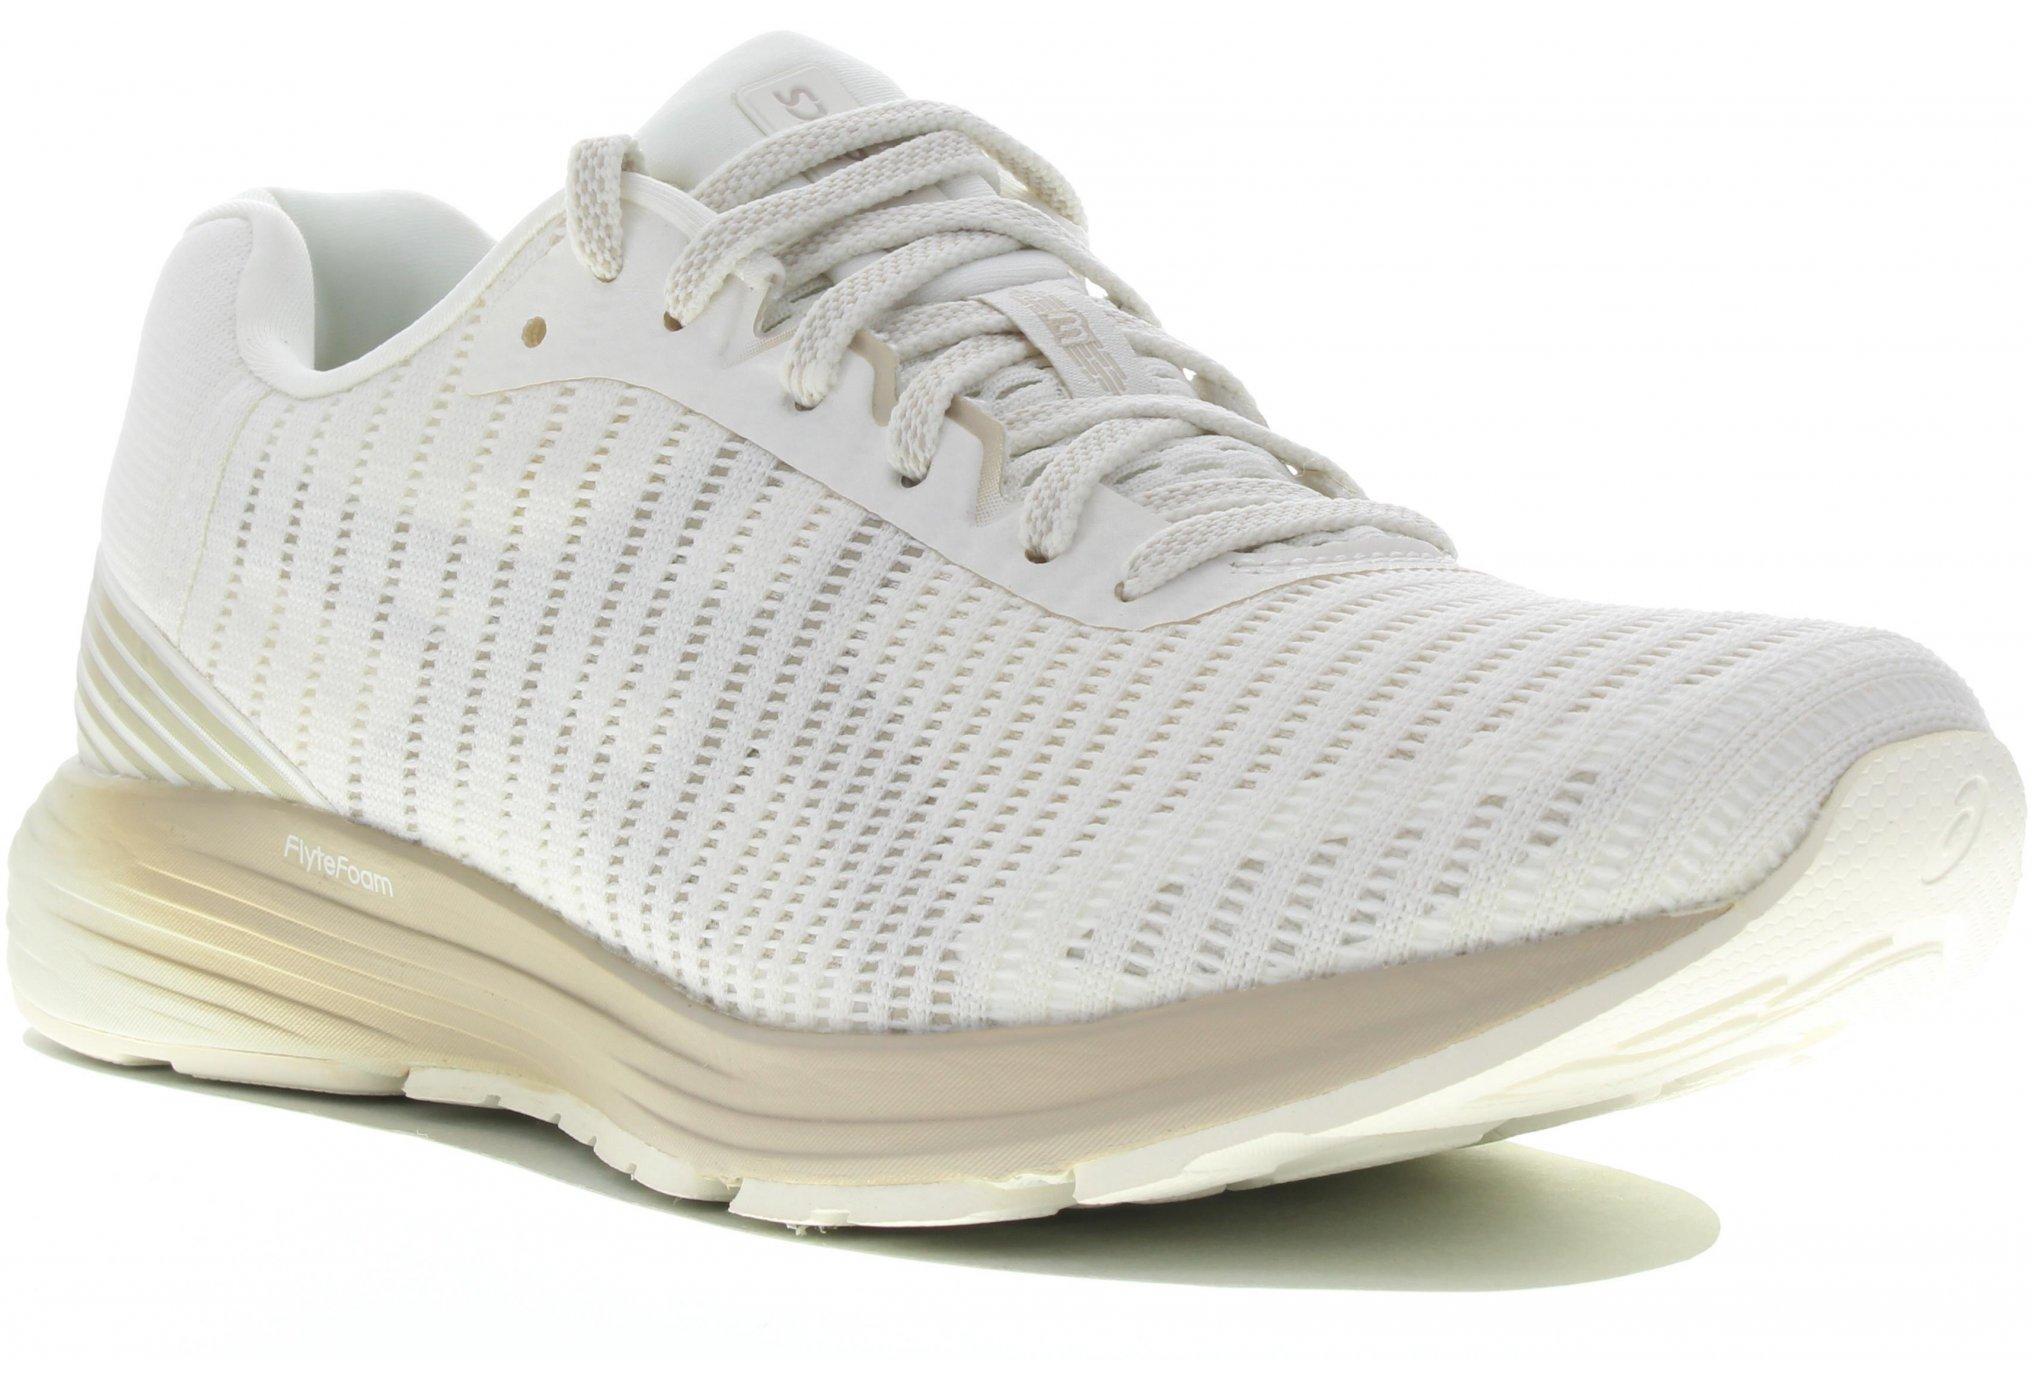 Asics Dynaflyte 3 Sound Chaussures running femme